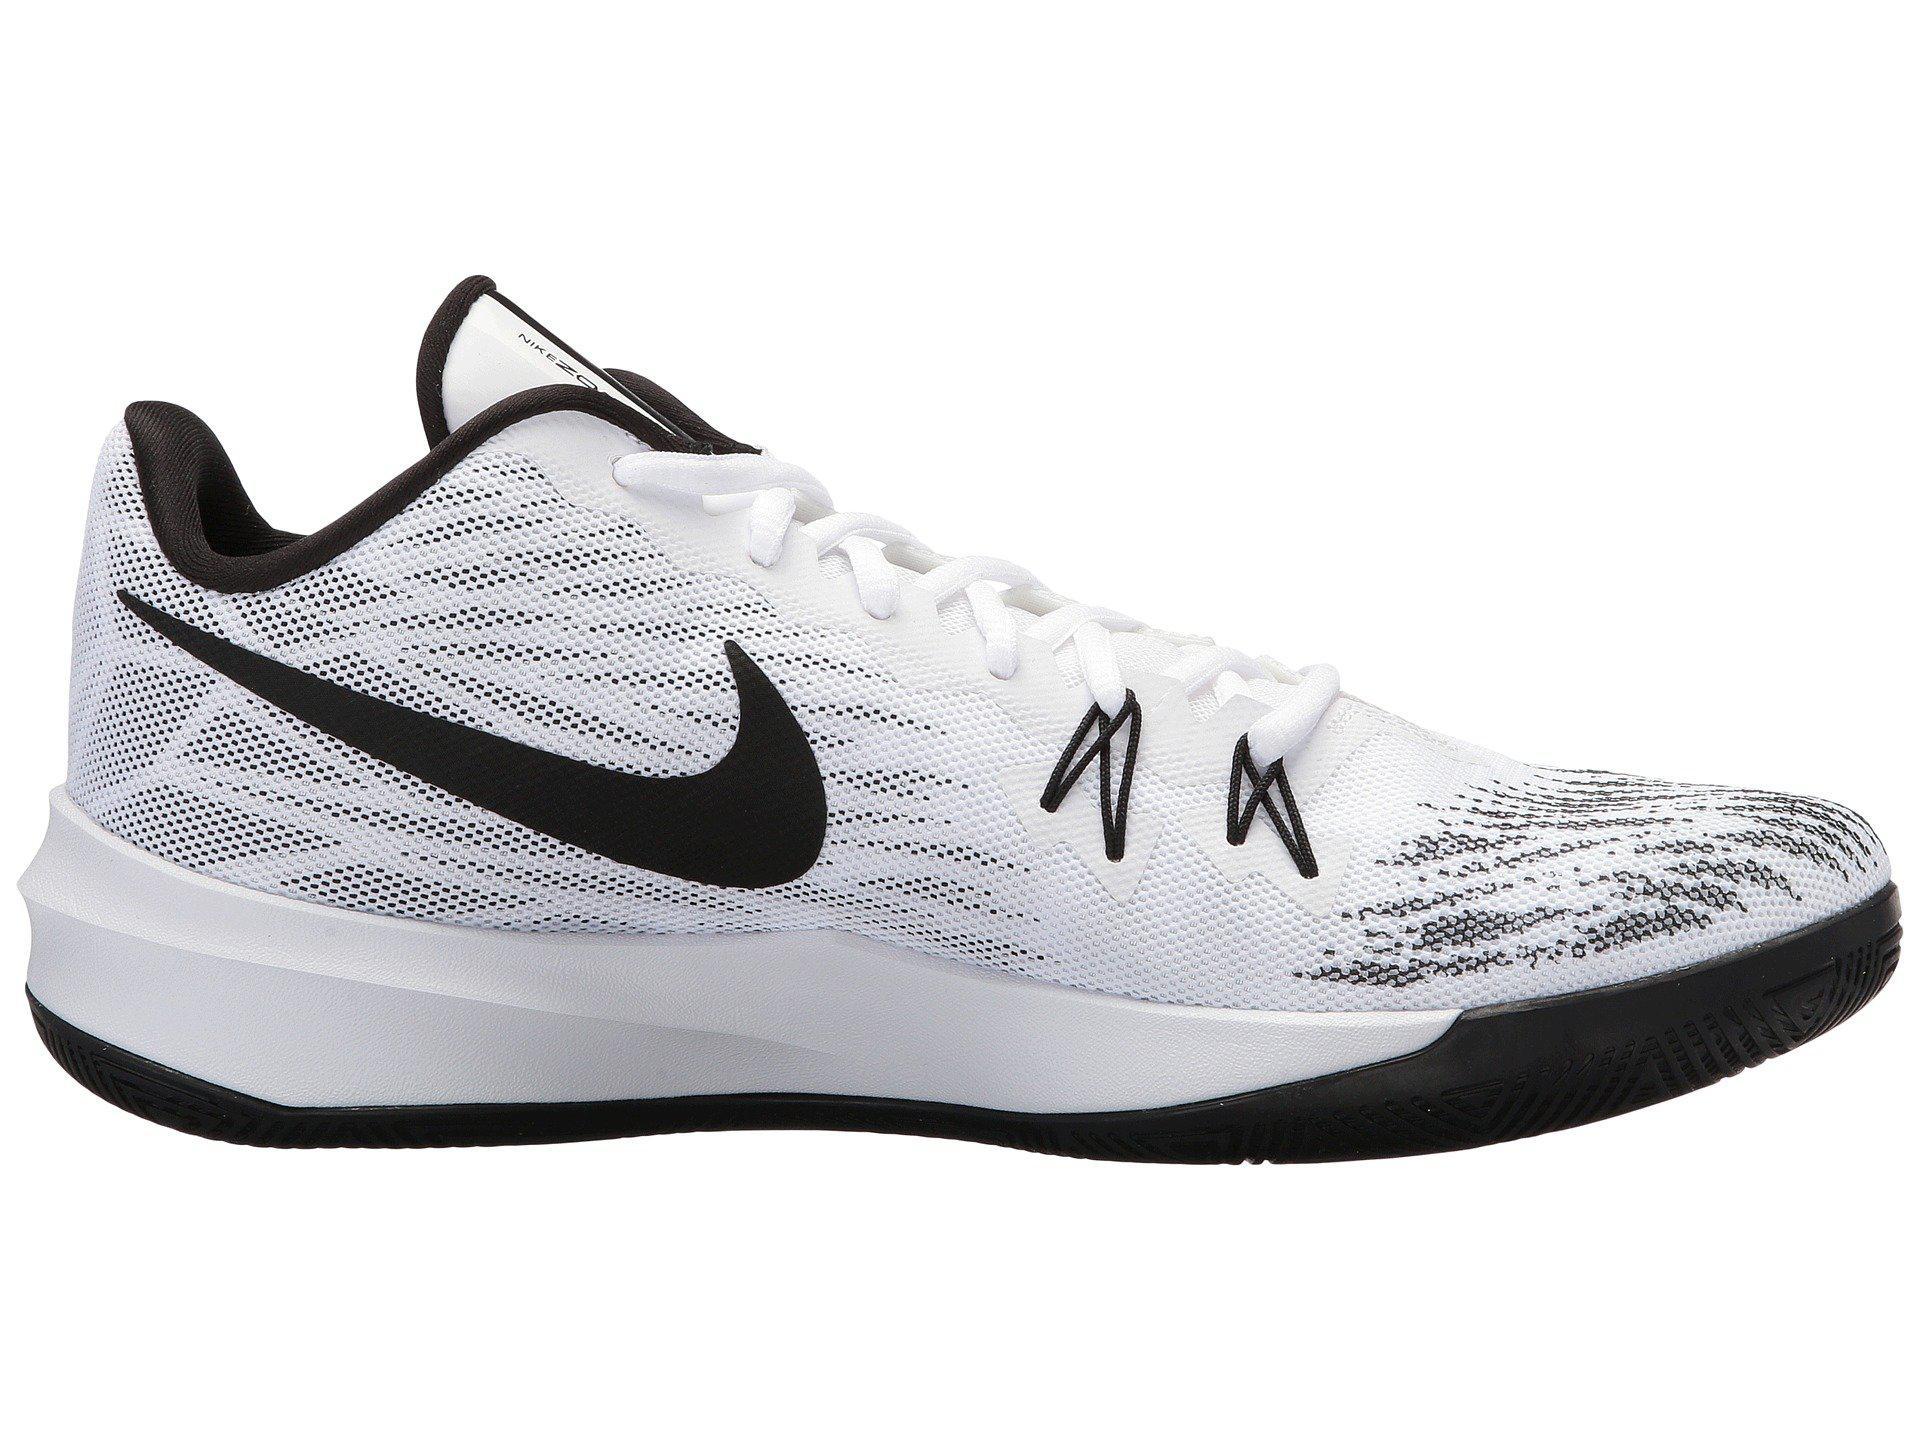 55e906416b6a3 Men's Zoom Evidence Ii (white/black/white) Basketball Shoes